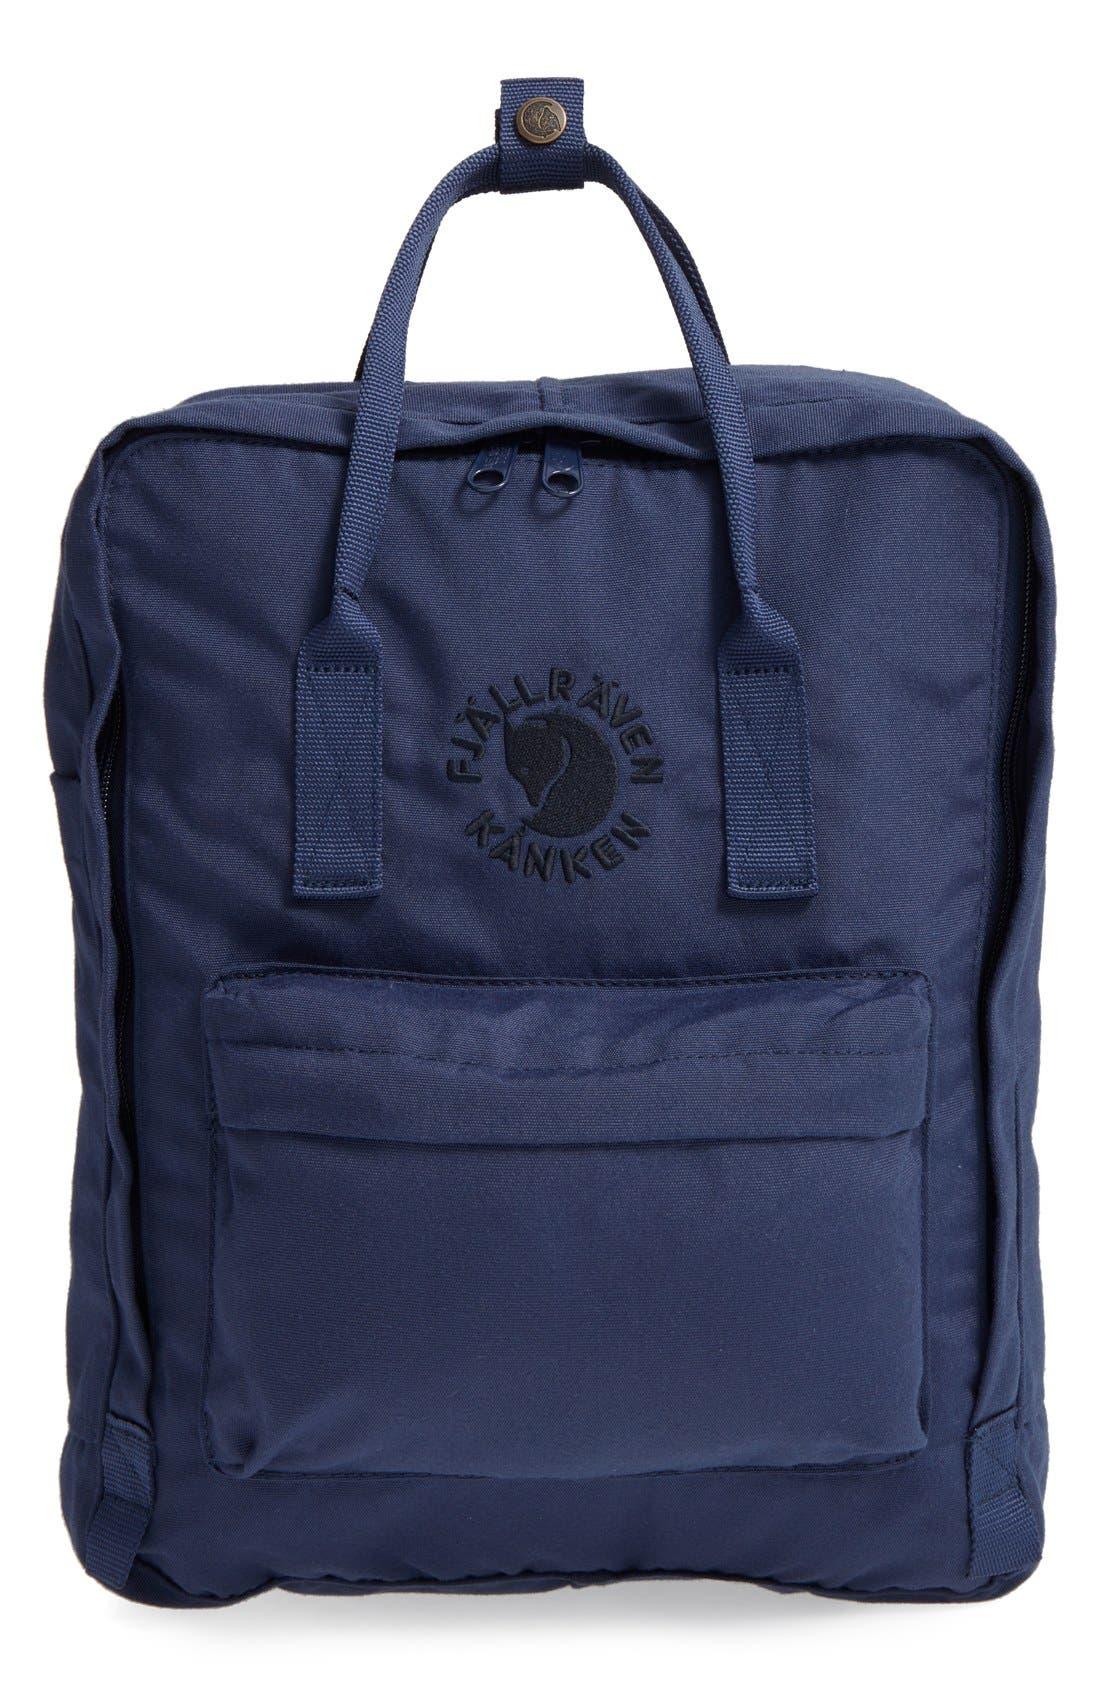 Fjällräven Re-Kånken Water Resistant Backpack